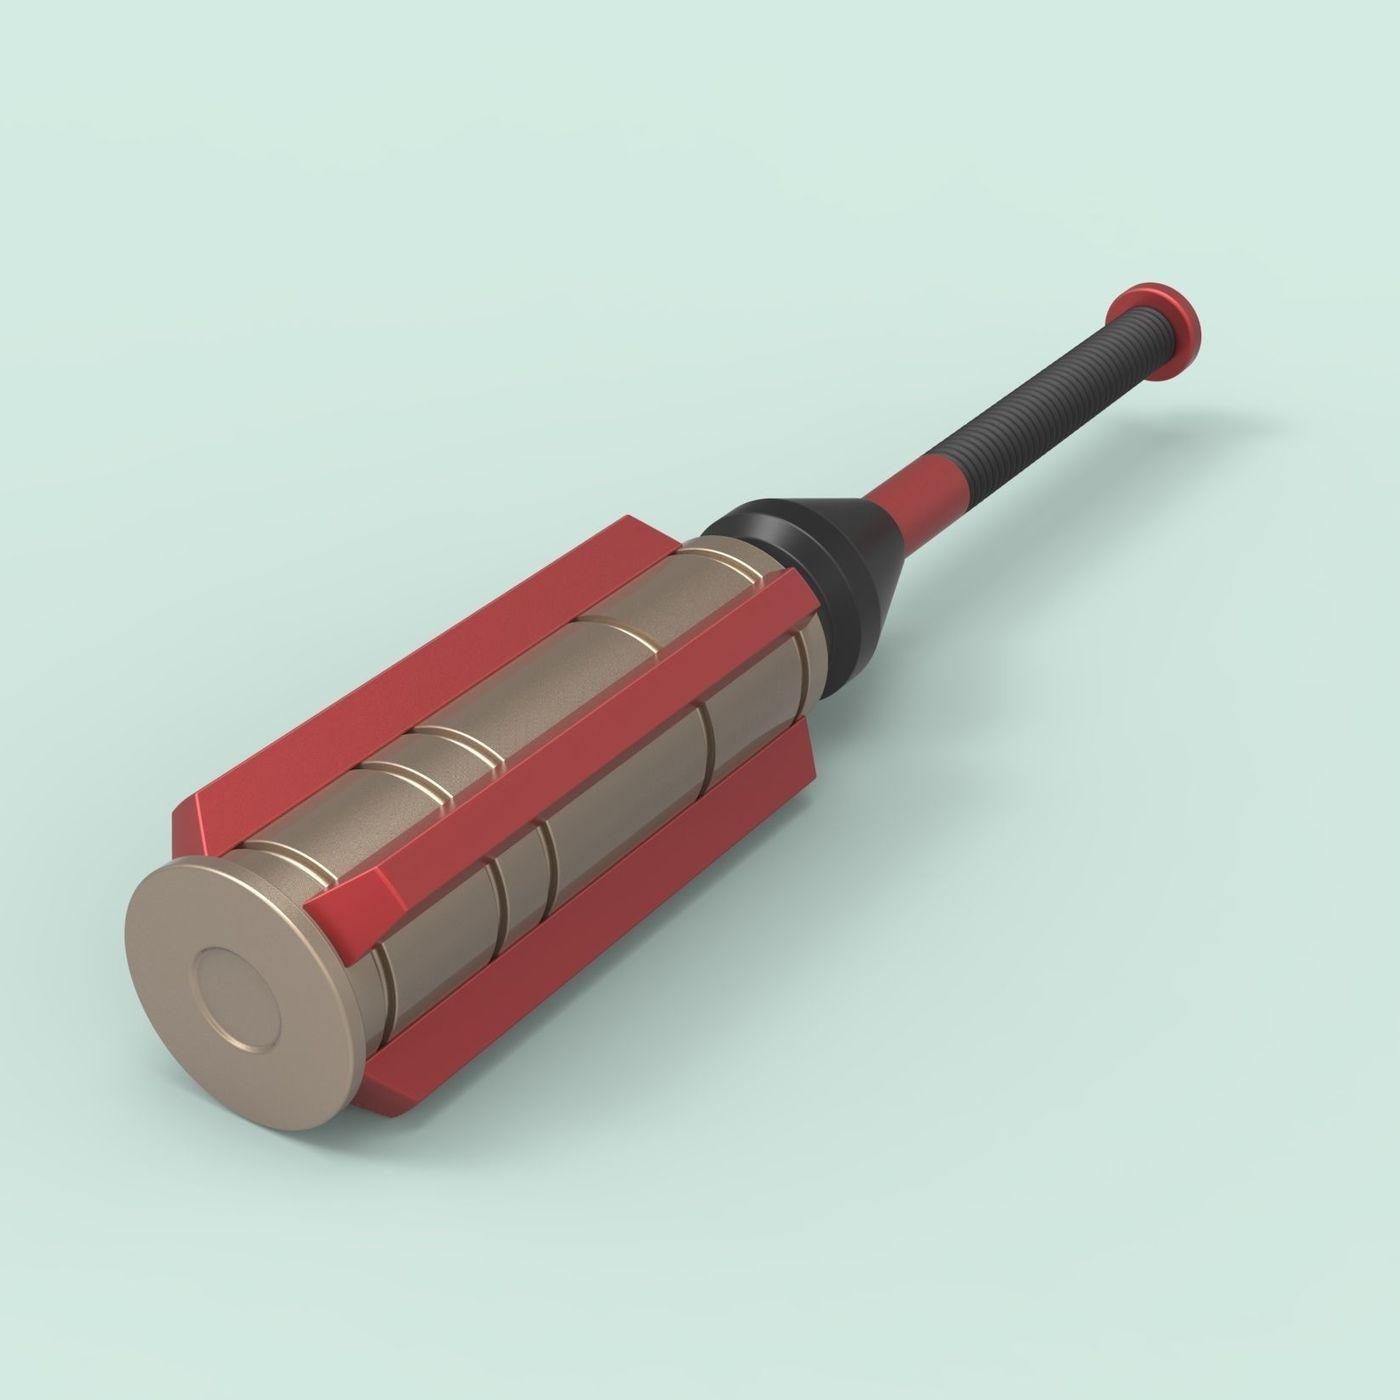 Thor's baton from Thor Ragnarok